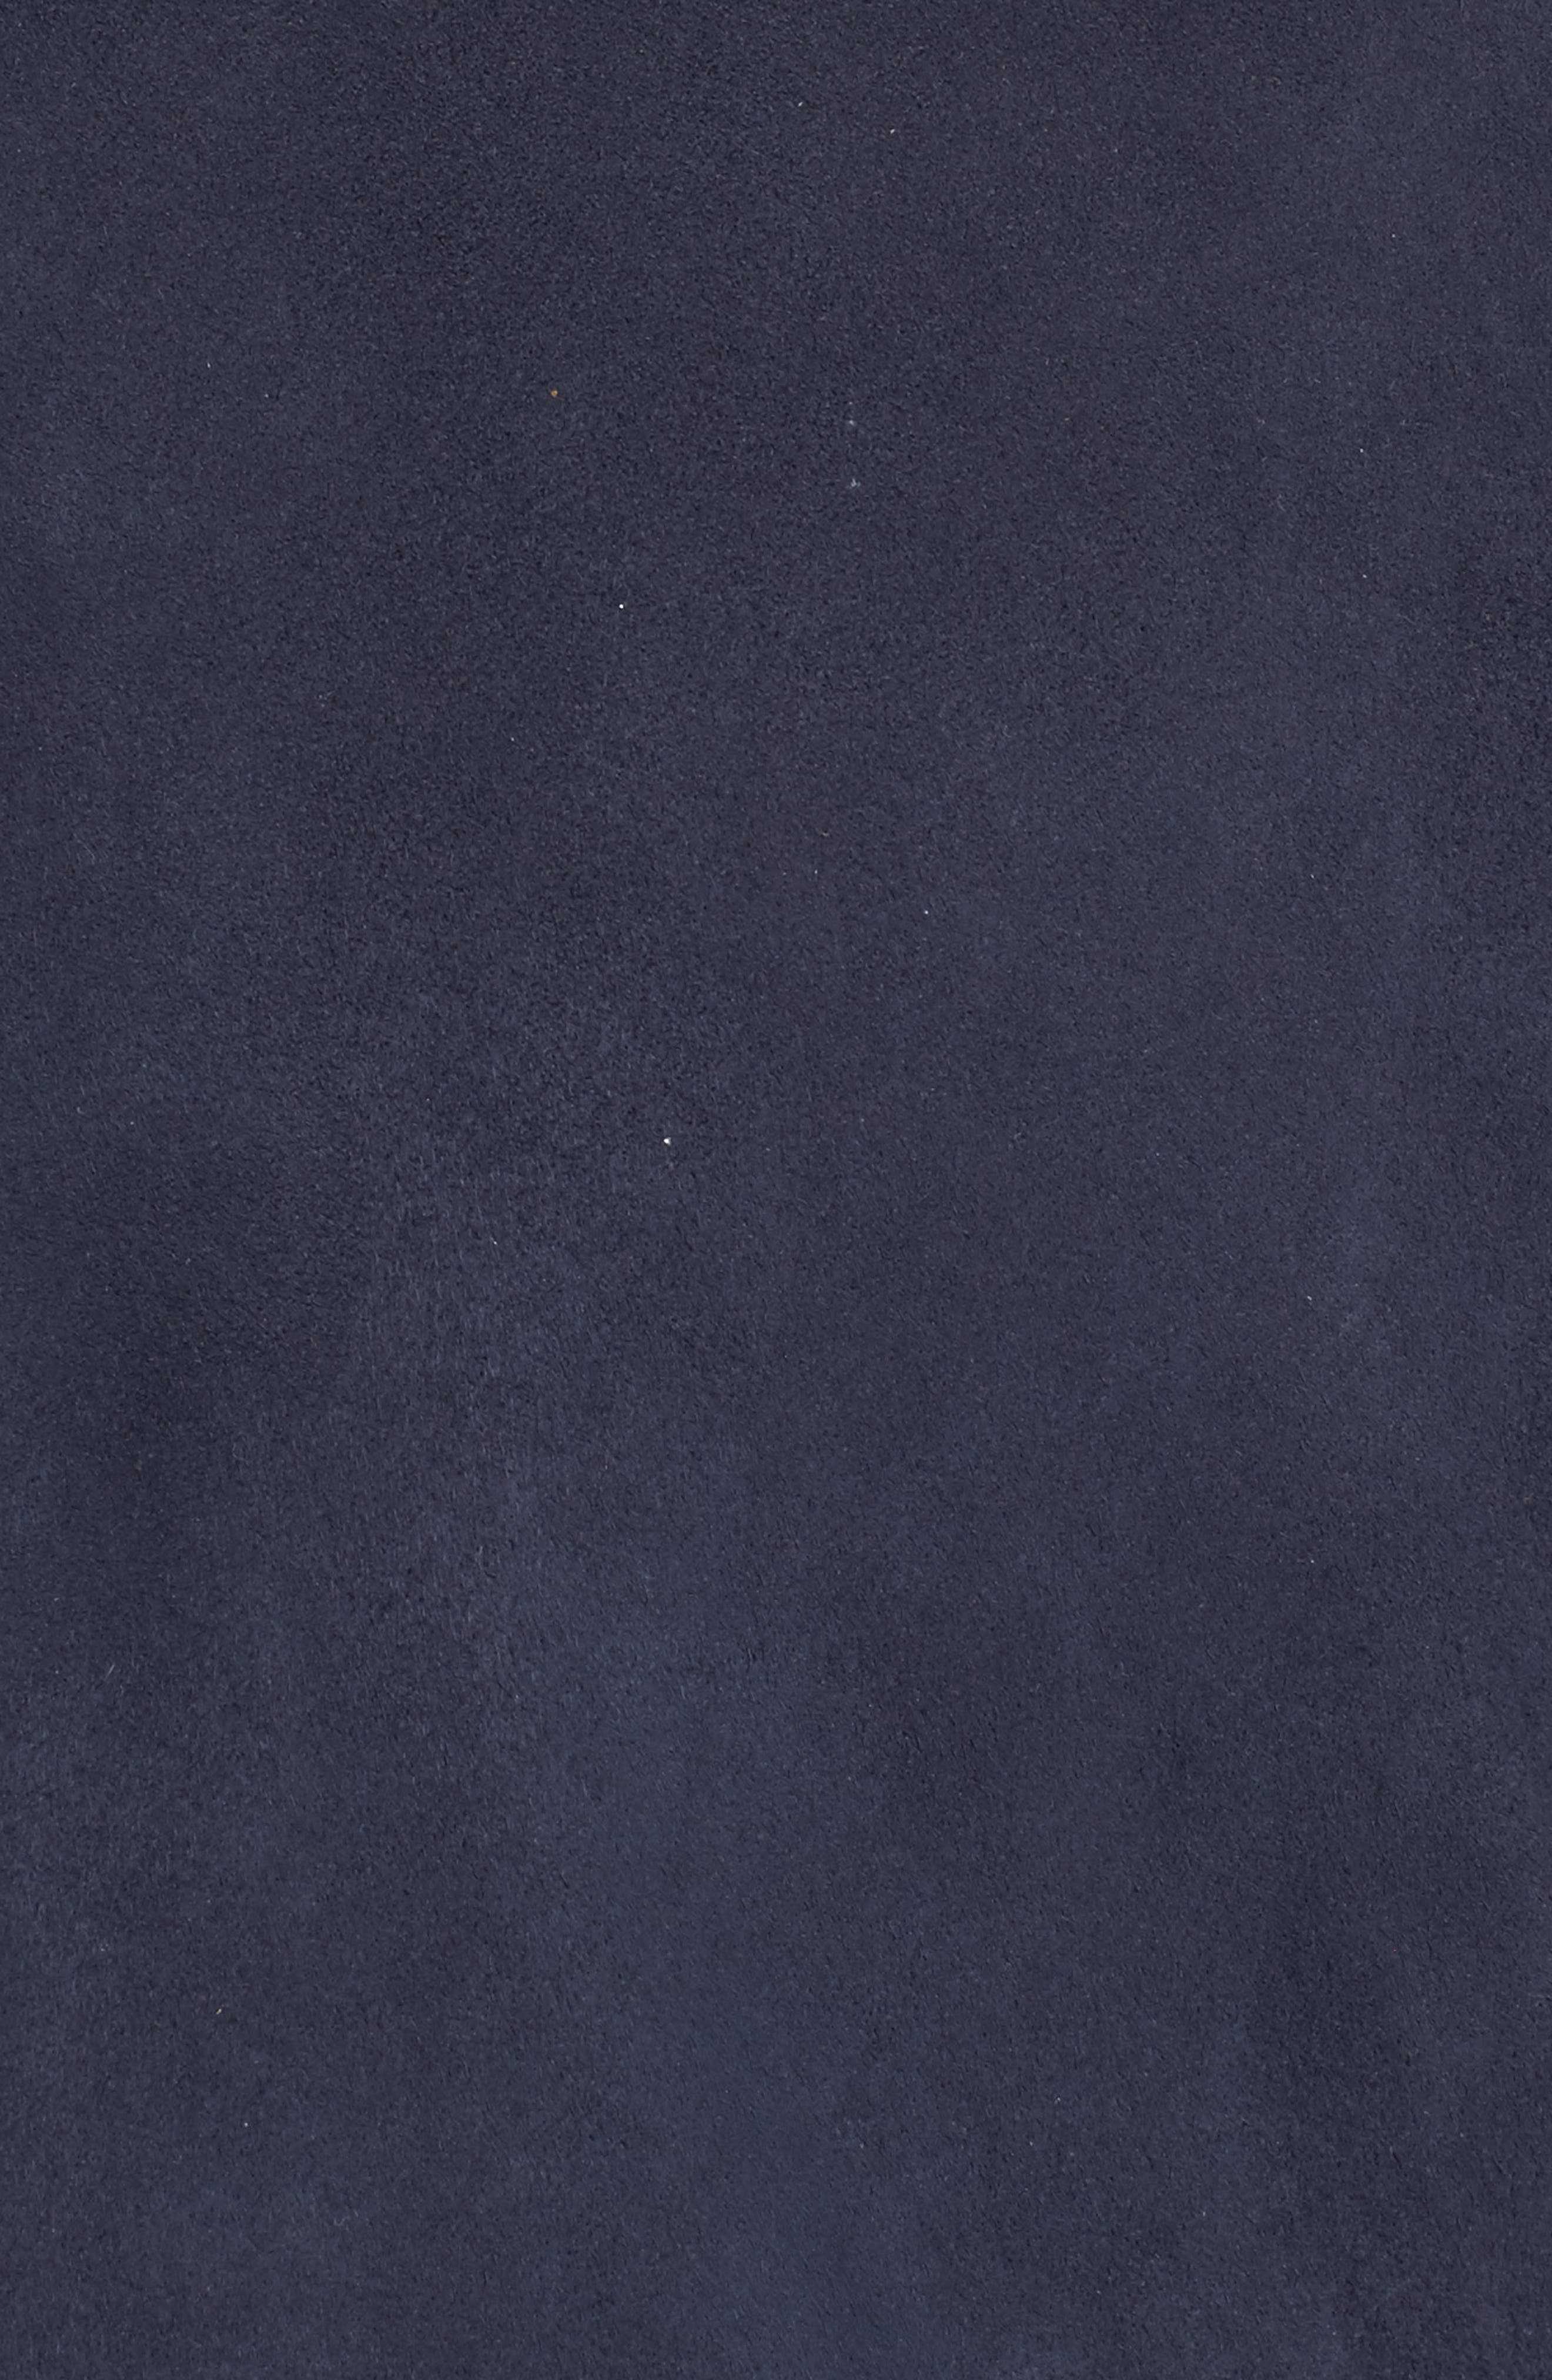 Suede Bomber Jacket,                             Alternate thumbnail 5, color,                             Navy Blue